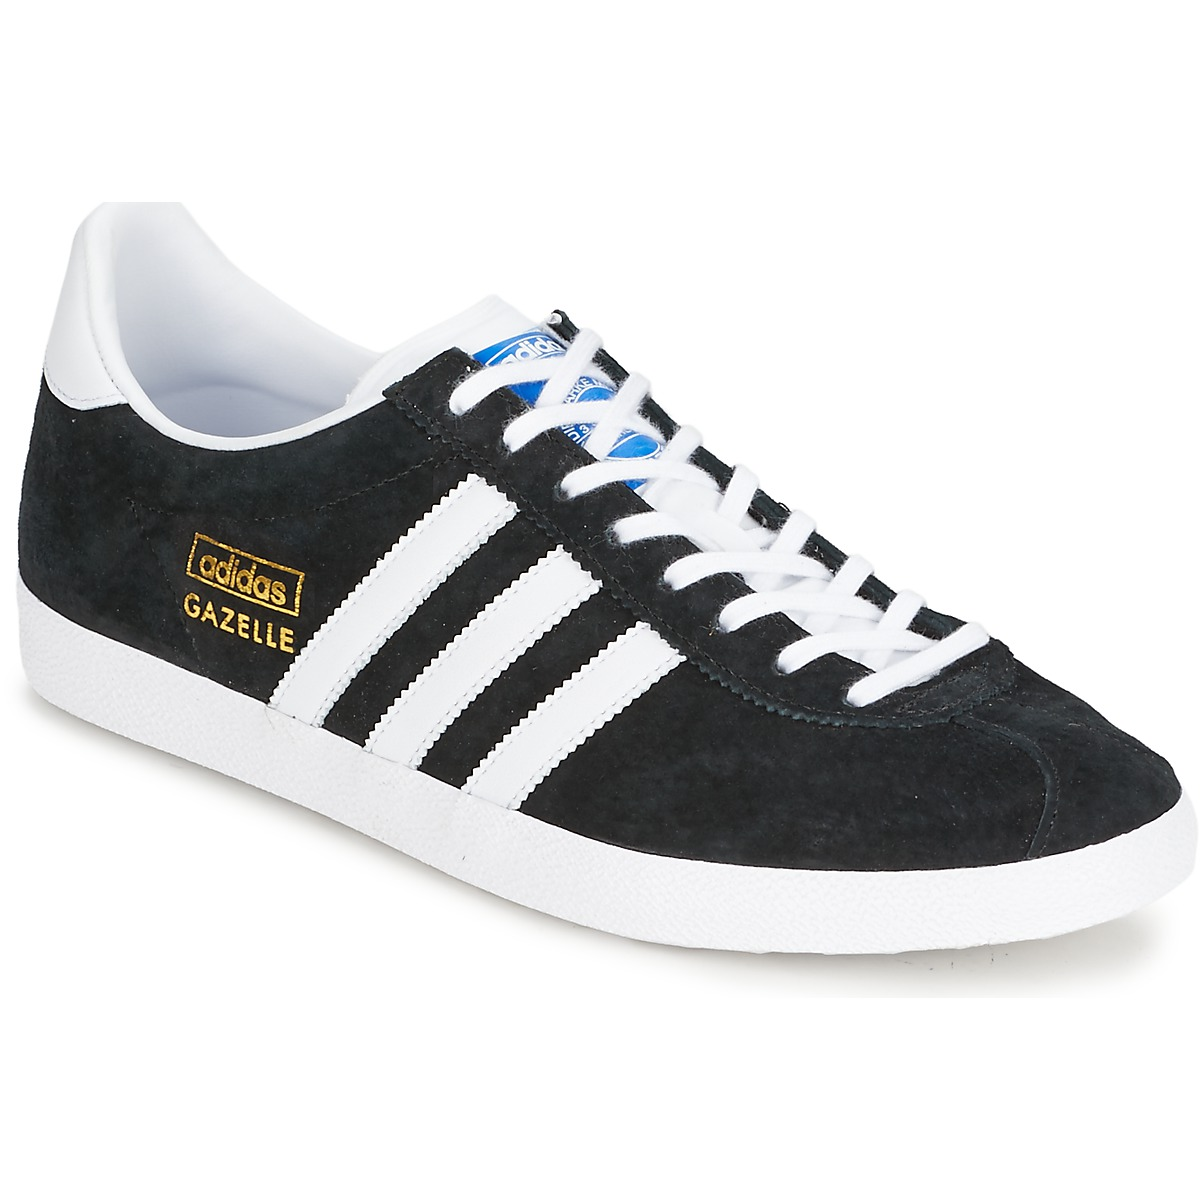 Chaussures Gazelle CoralGranite W e17 adidas Originals